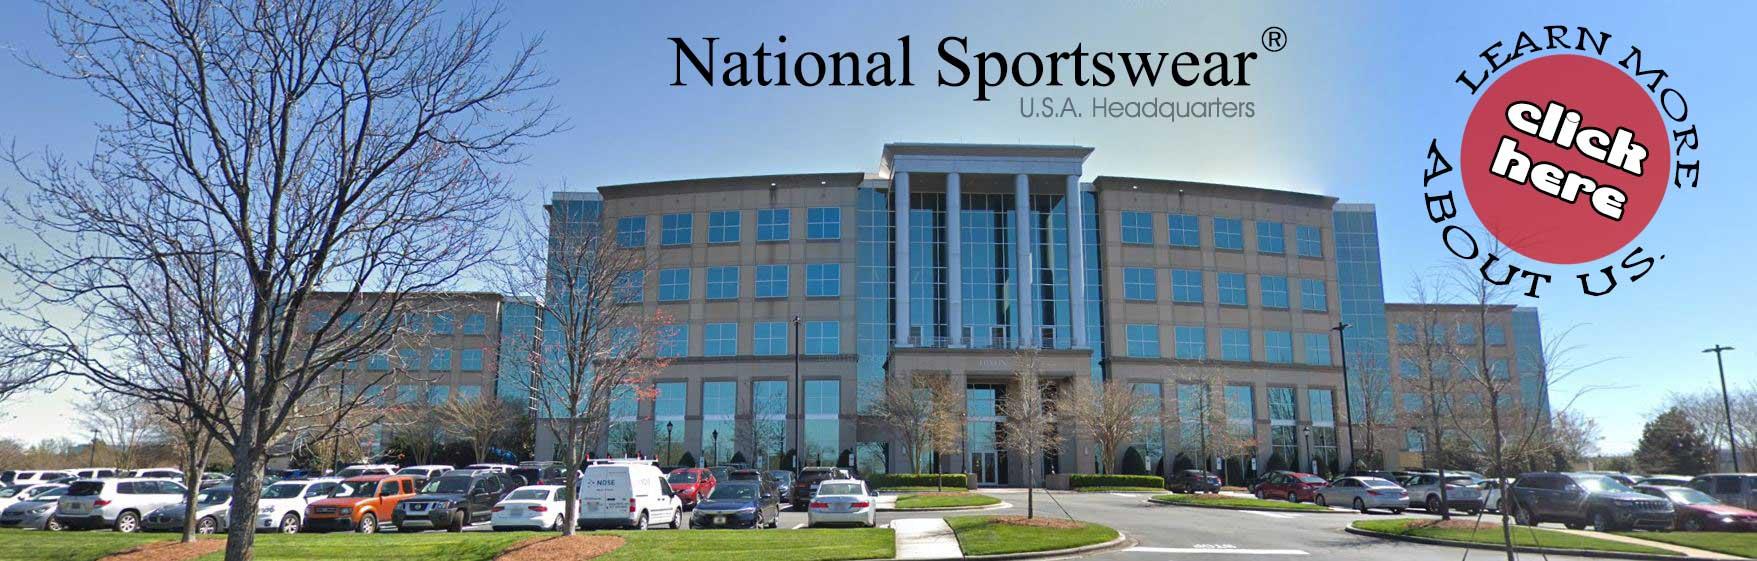 about national sportswear